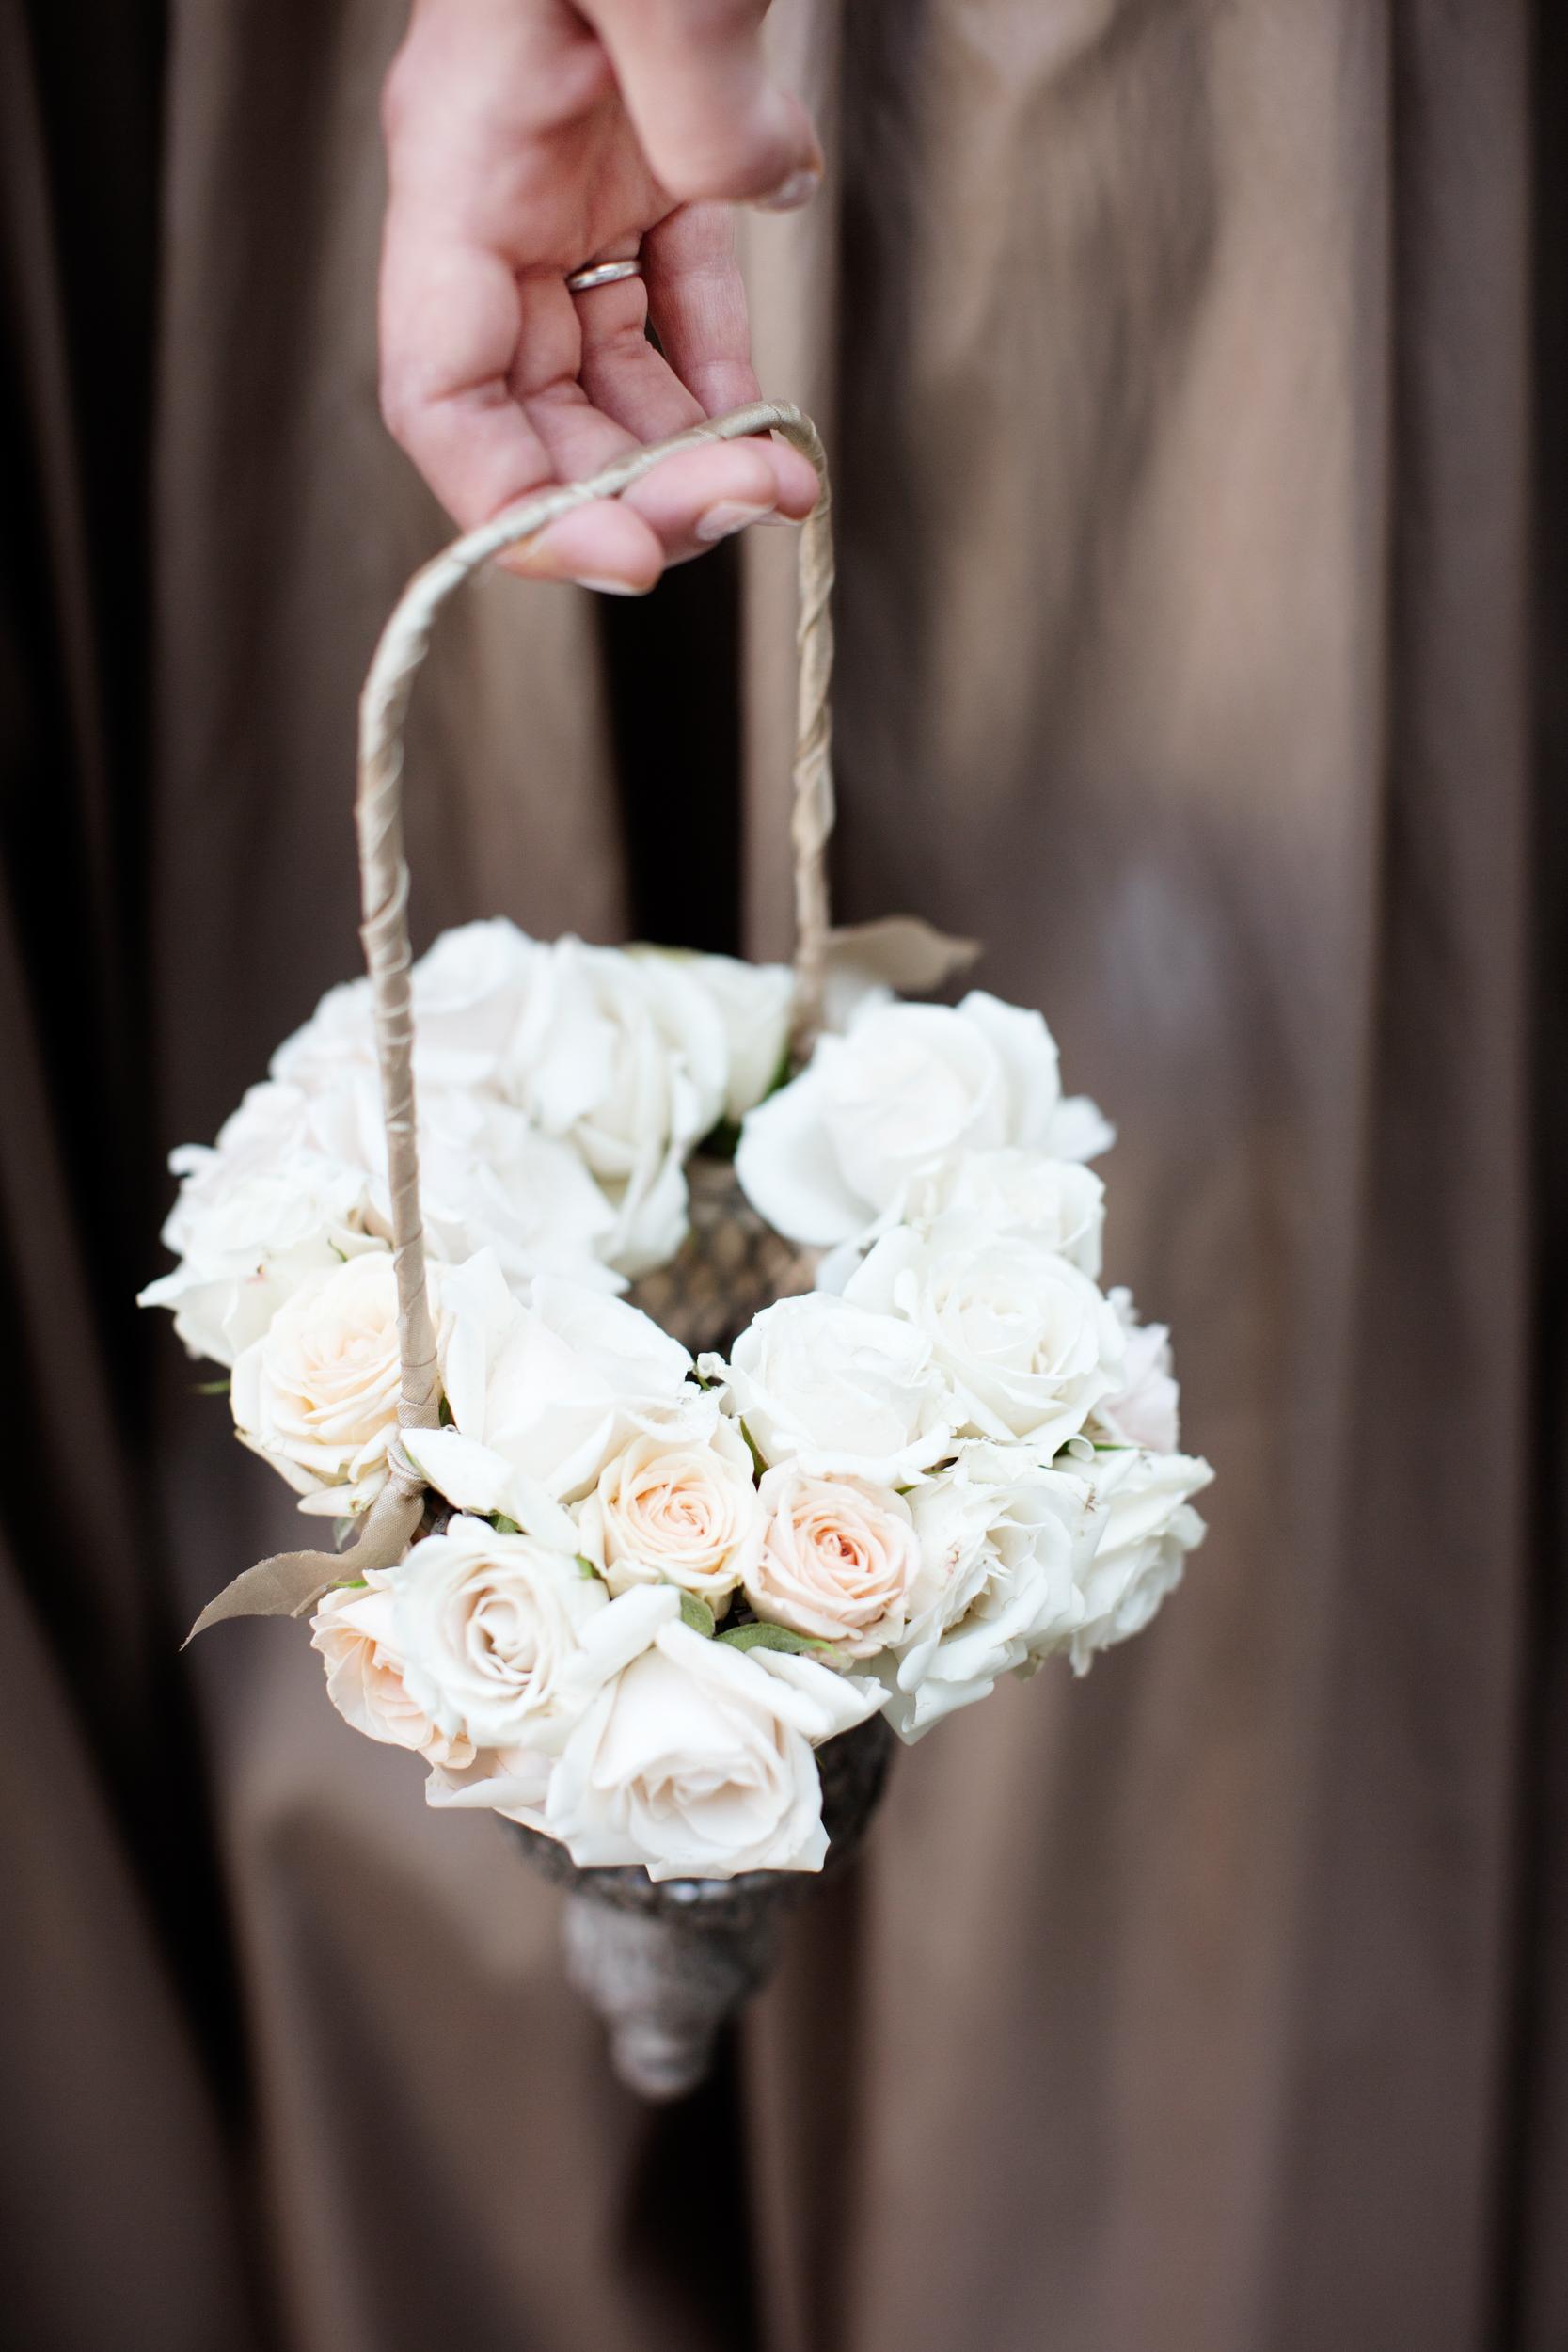 Ceci_New_York_Ceci_Style_Ceci_Johnson_Luxury_Lifestyle_Floral_Lace_Wedding_Letterpress_Inspiration_Design_Custom_Couture_Personalized_Invitations_-95.jpg